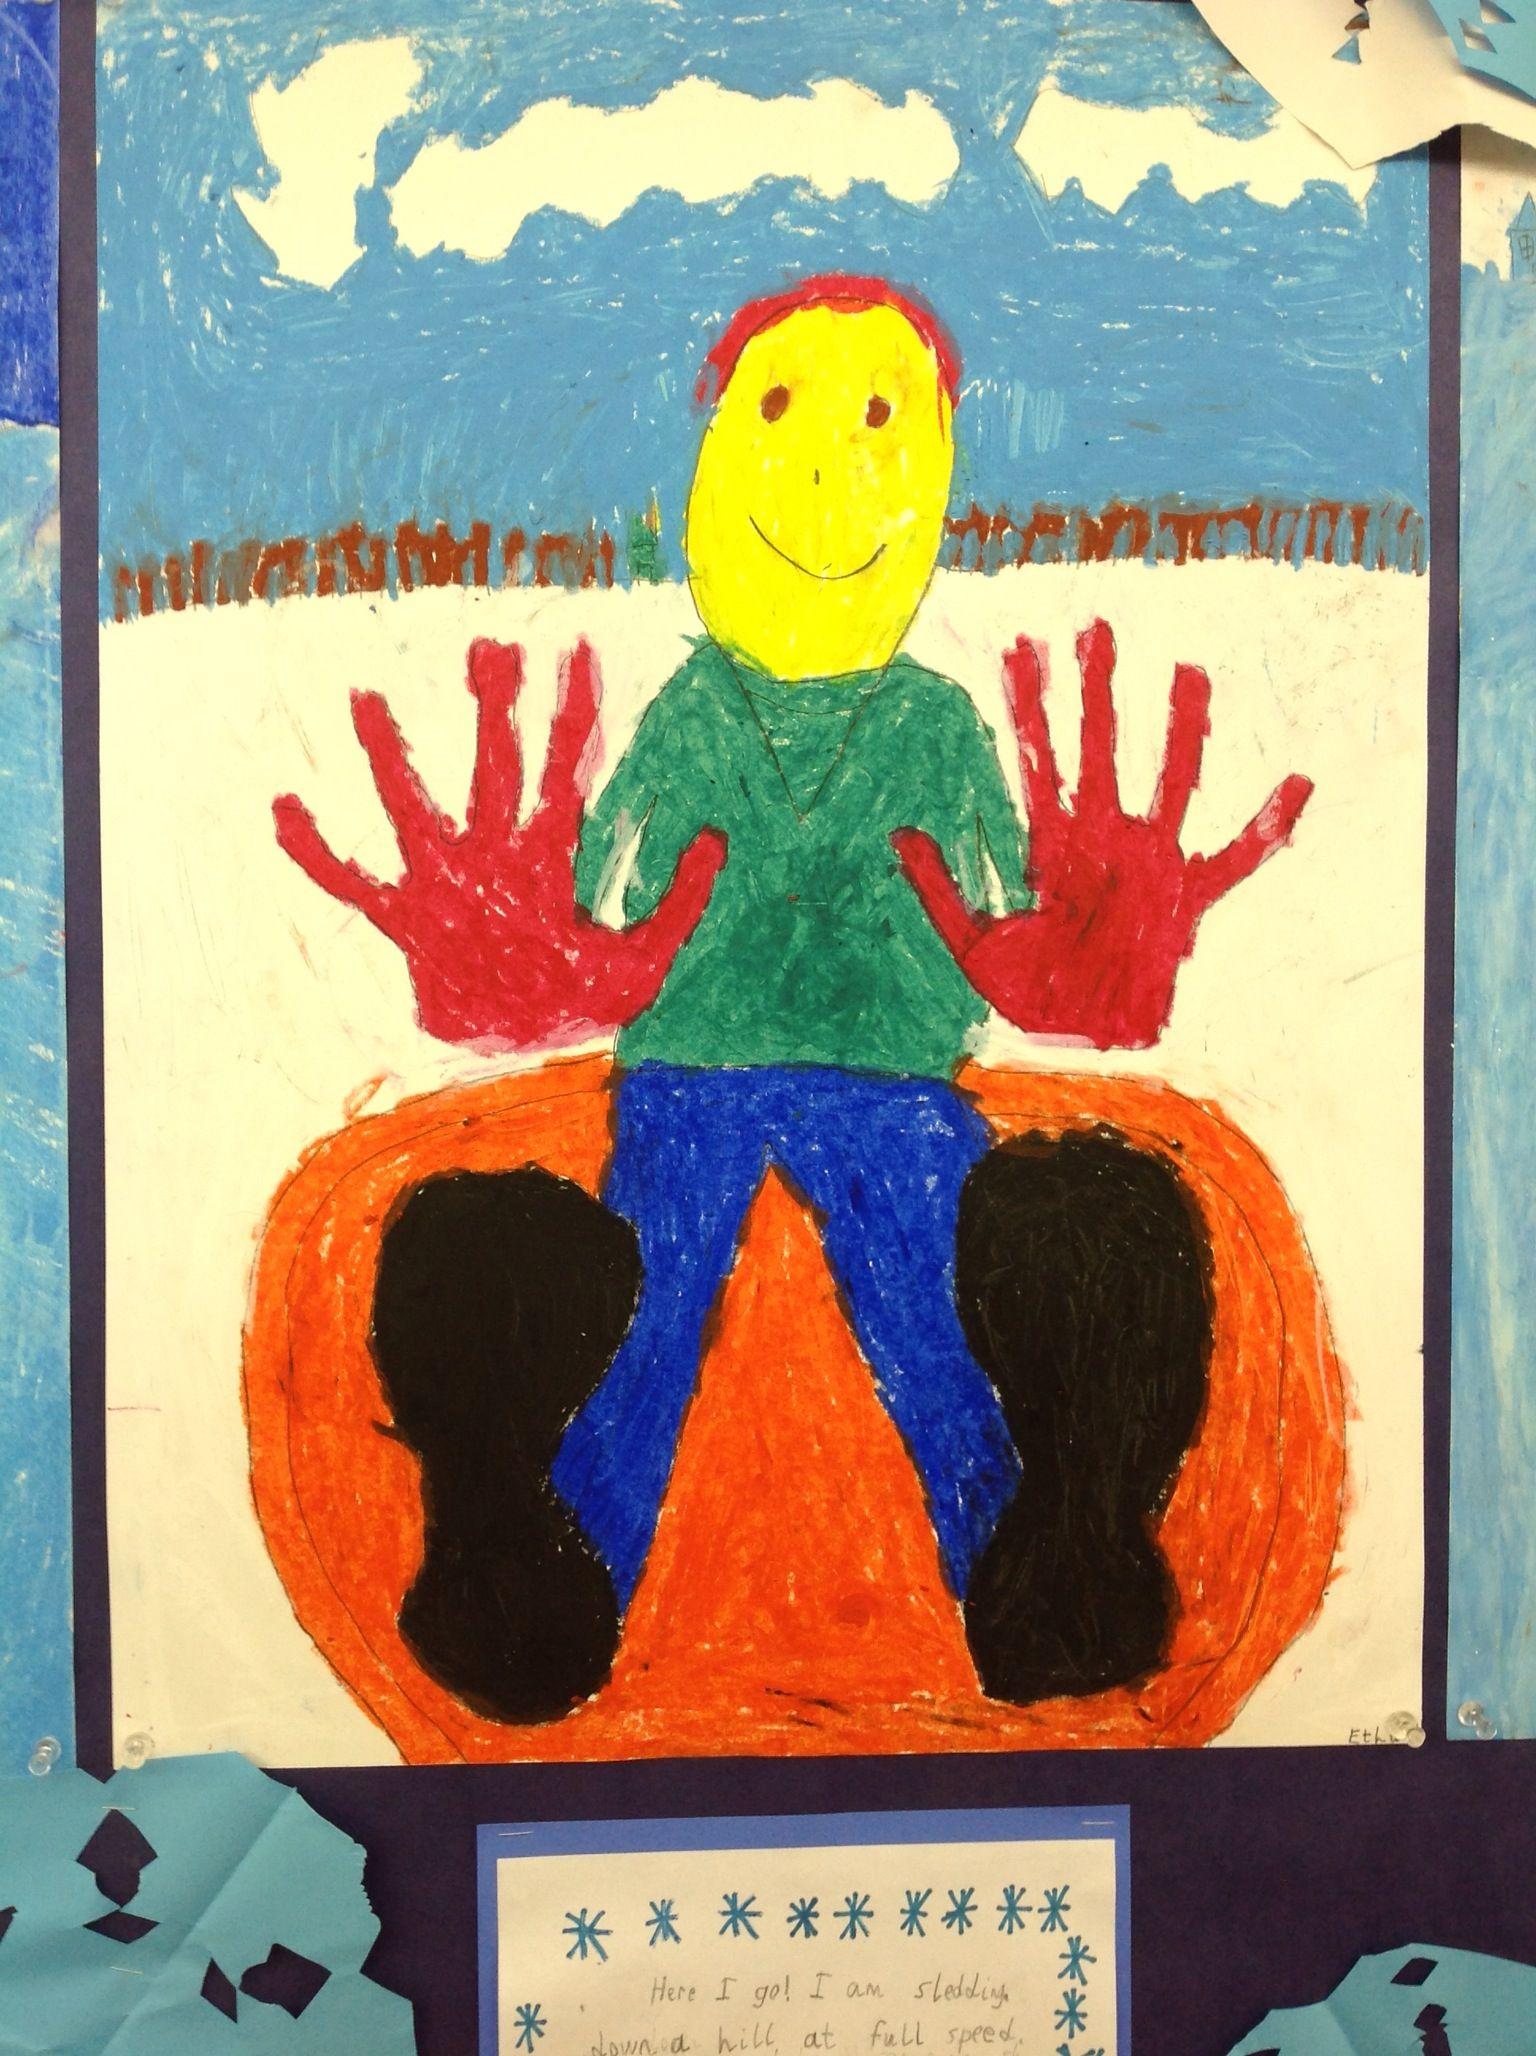 Third Grade Artist Water Based Oil Pastel Drawing